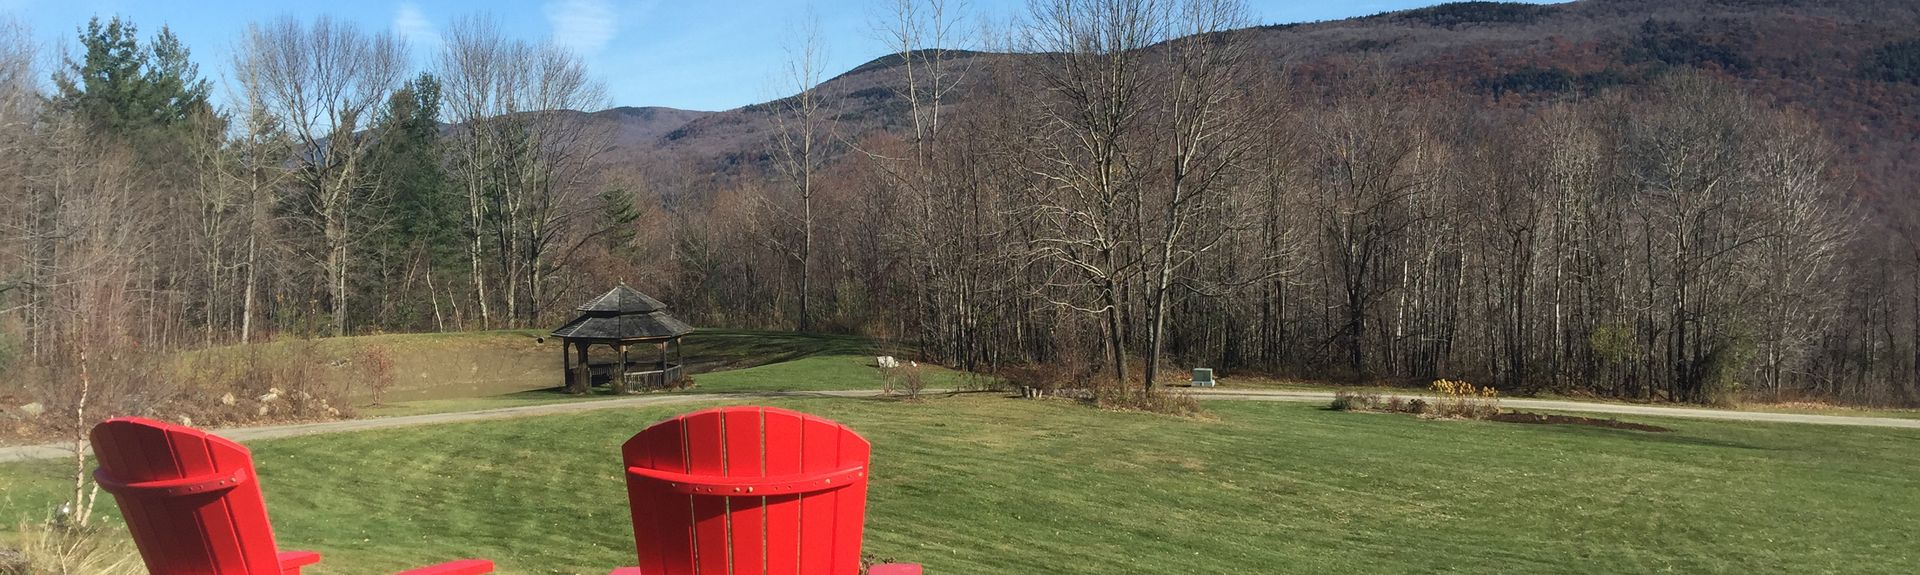 Lye Brook Falls, Manchester Center, Bennington County, Vermont, United States of America